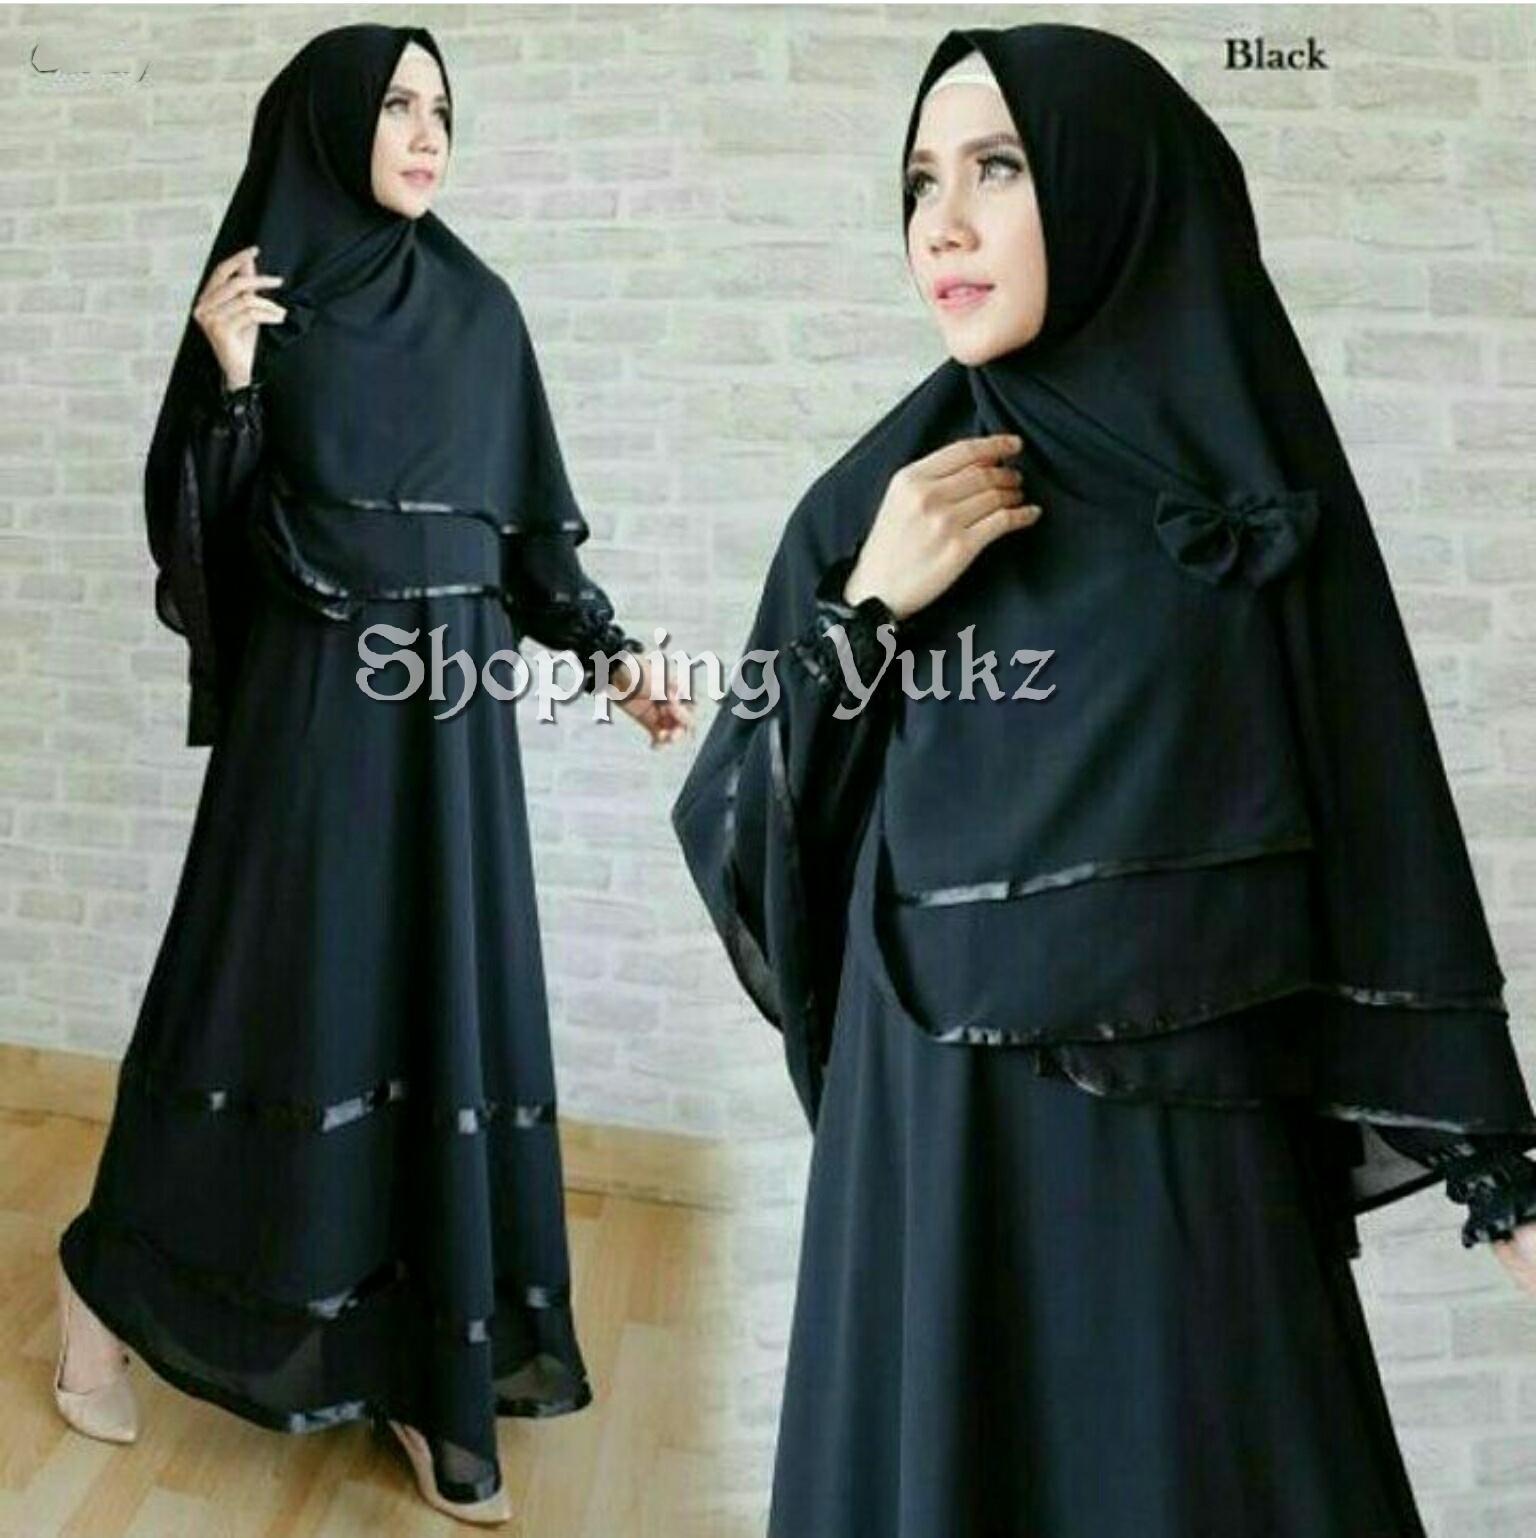 Shopping Yukz Baju Gamis Muslim Syari FITRI - HITAM ( Dapat Jilbab ) /Dress Muslim / Fashion Muslim / Baju Muslimah / Gaun Muslim / Gamis Wanita / Hijab Muslim/ Gamis Murah